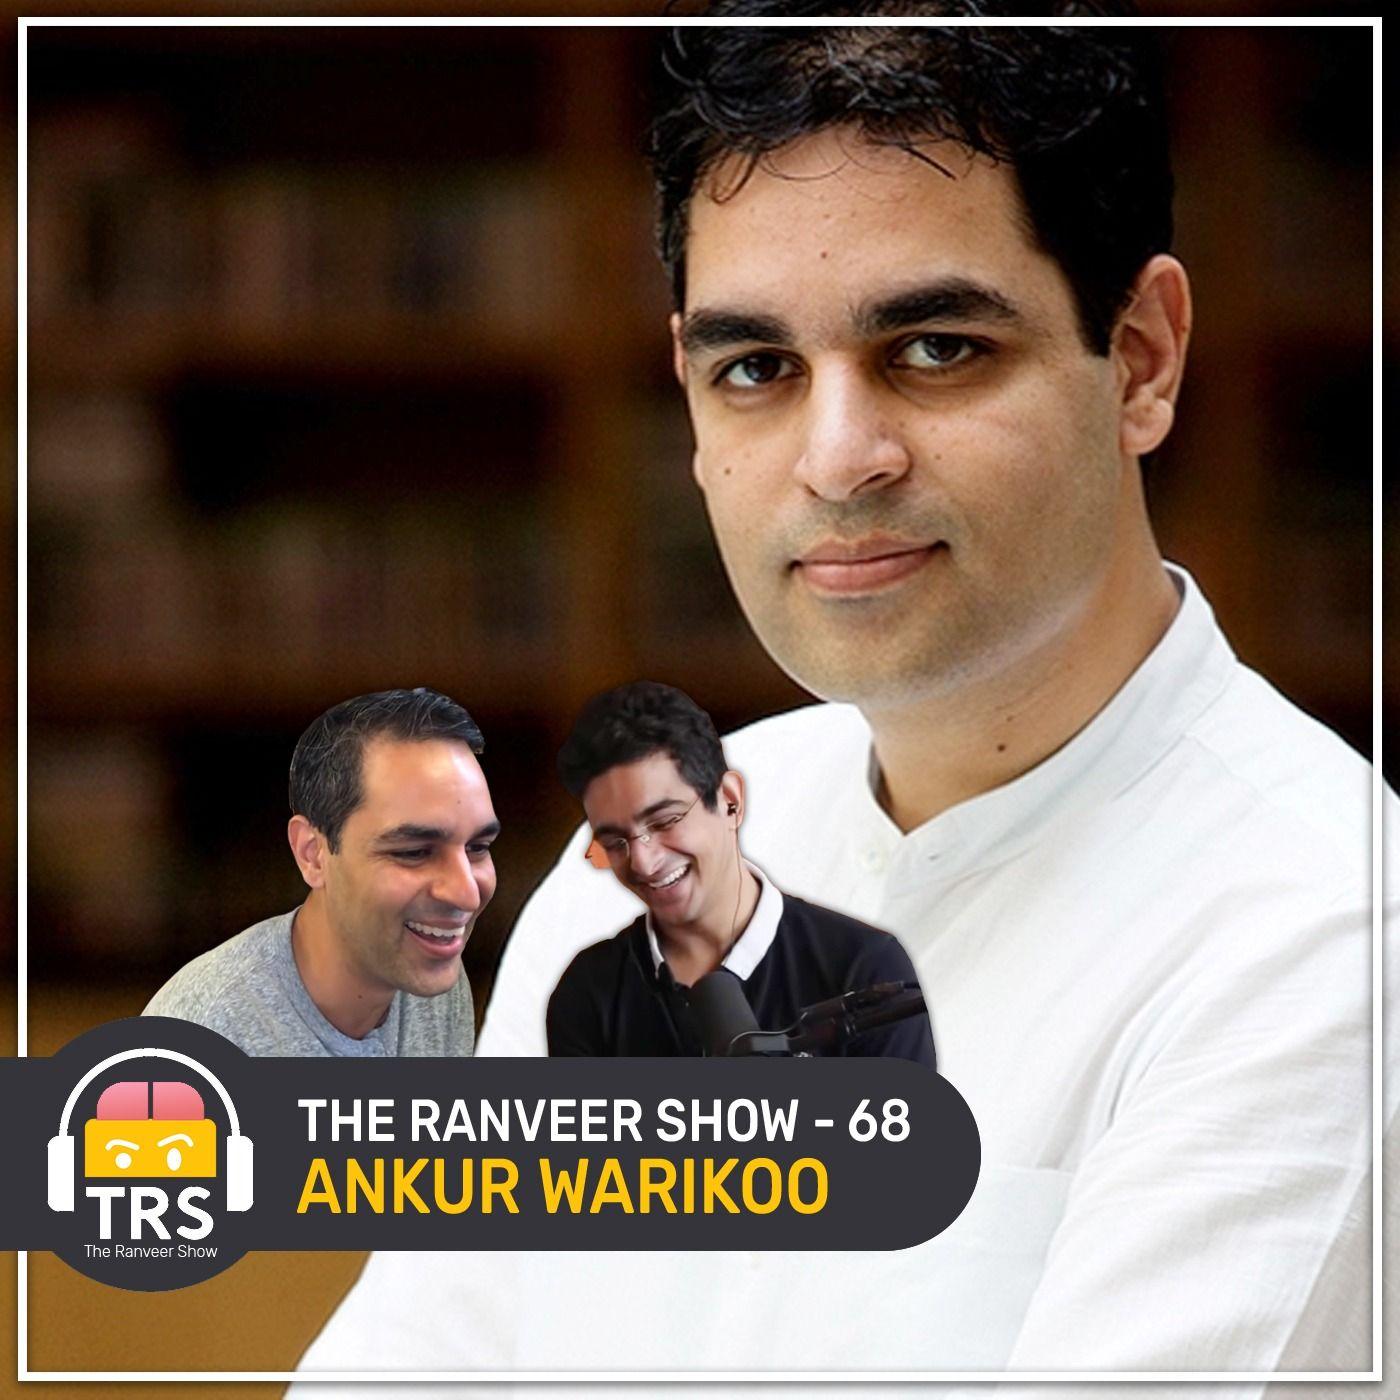 Ankur Warikoo on Aliens, Souls, Life & Time Travel   The Ranveer Show 68